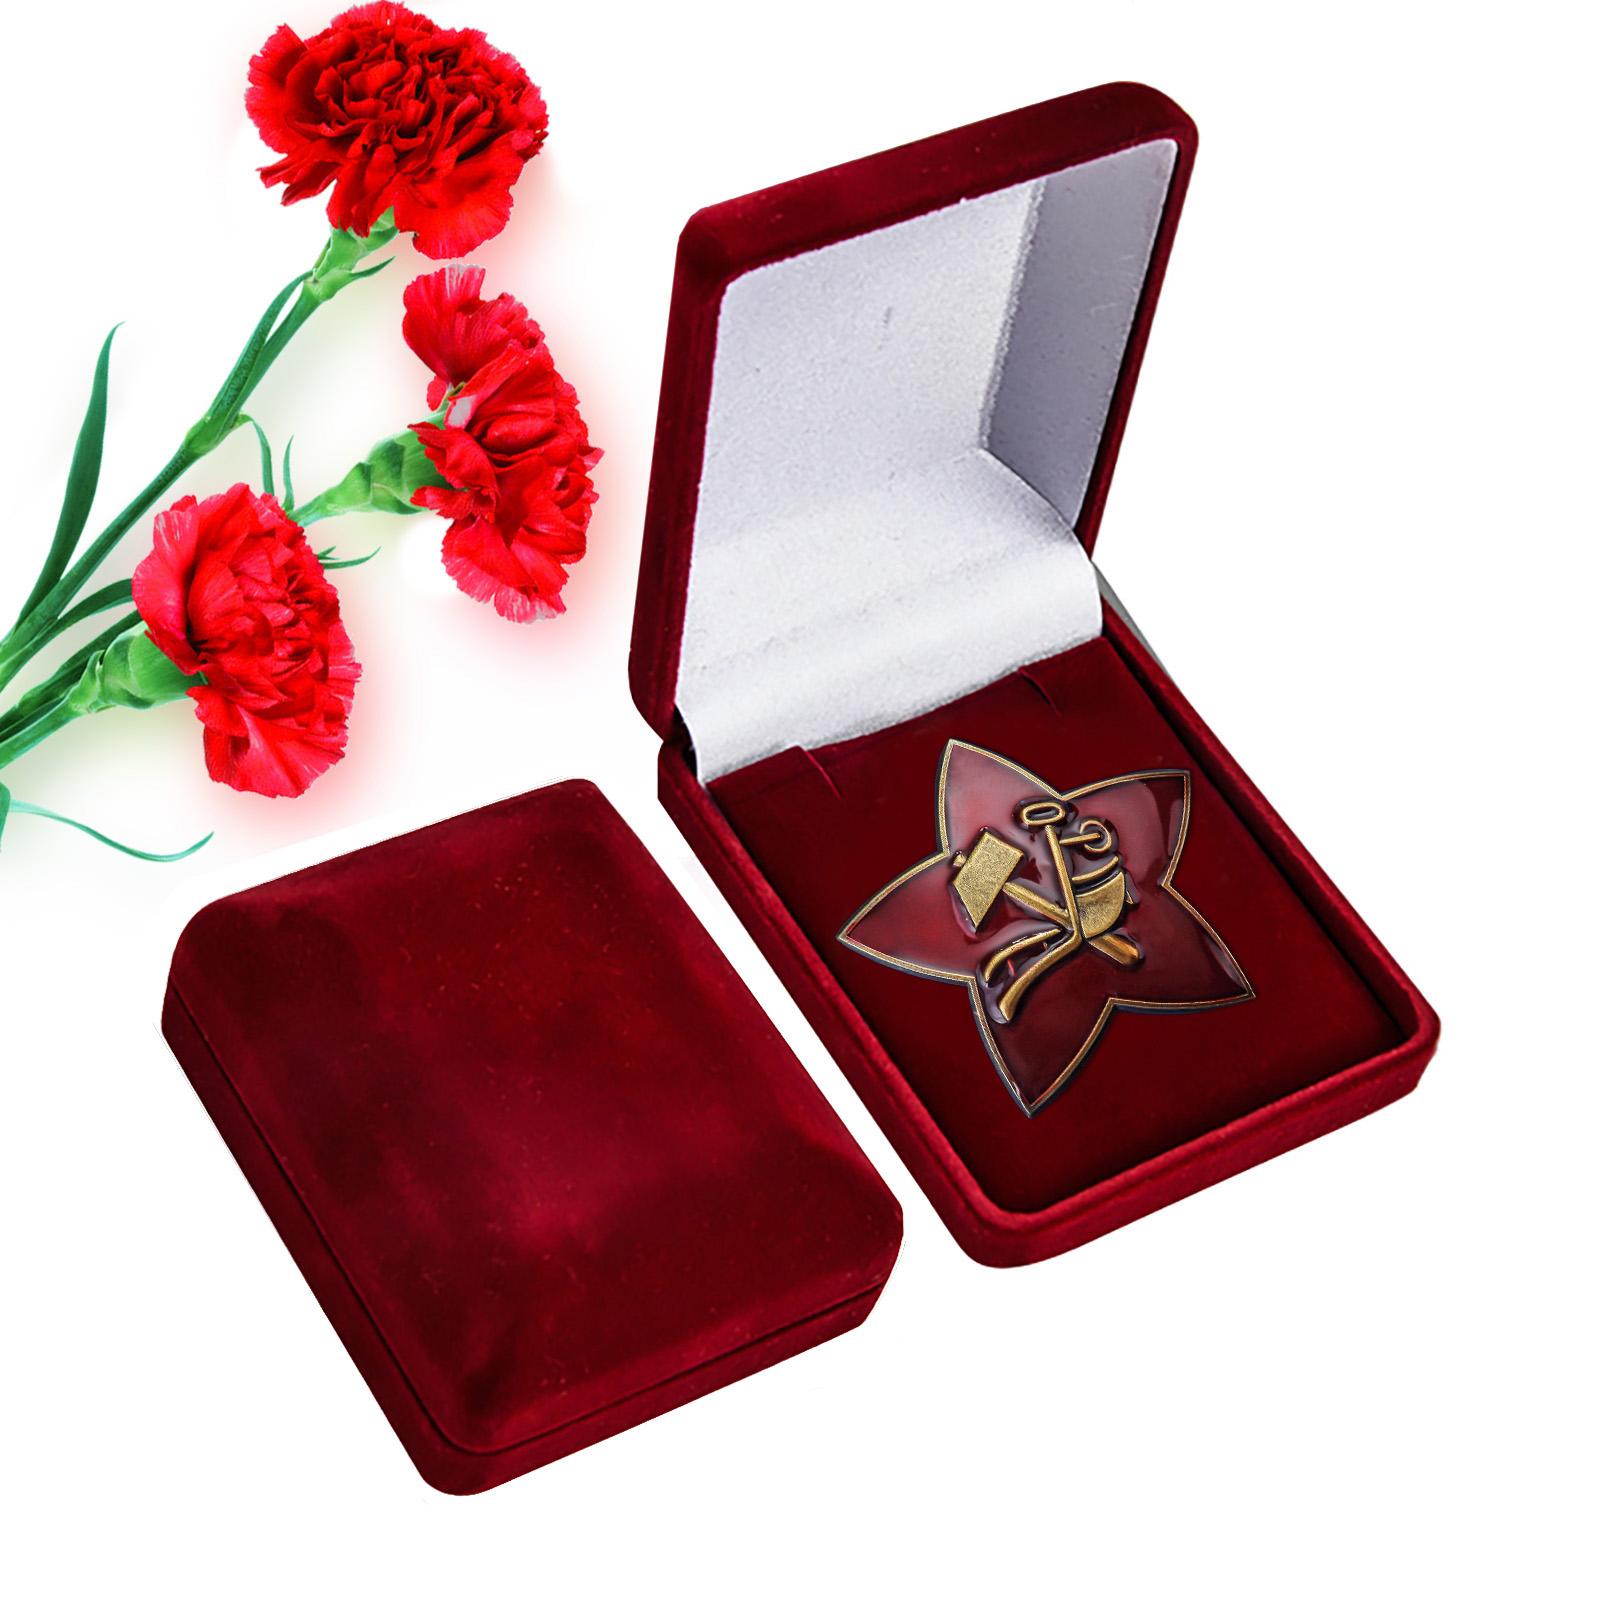 Латунная кокарда РККА 1918 г. - в красном презентабельном футляре